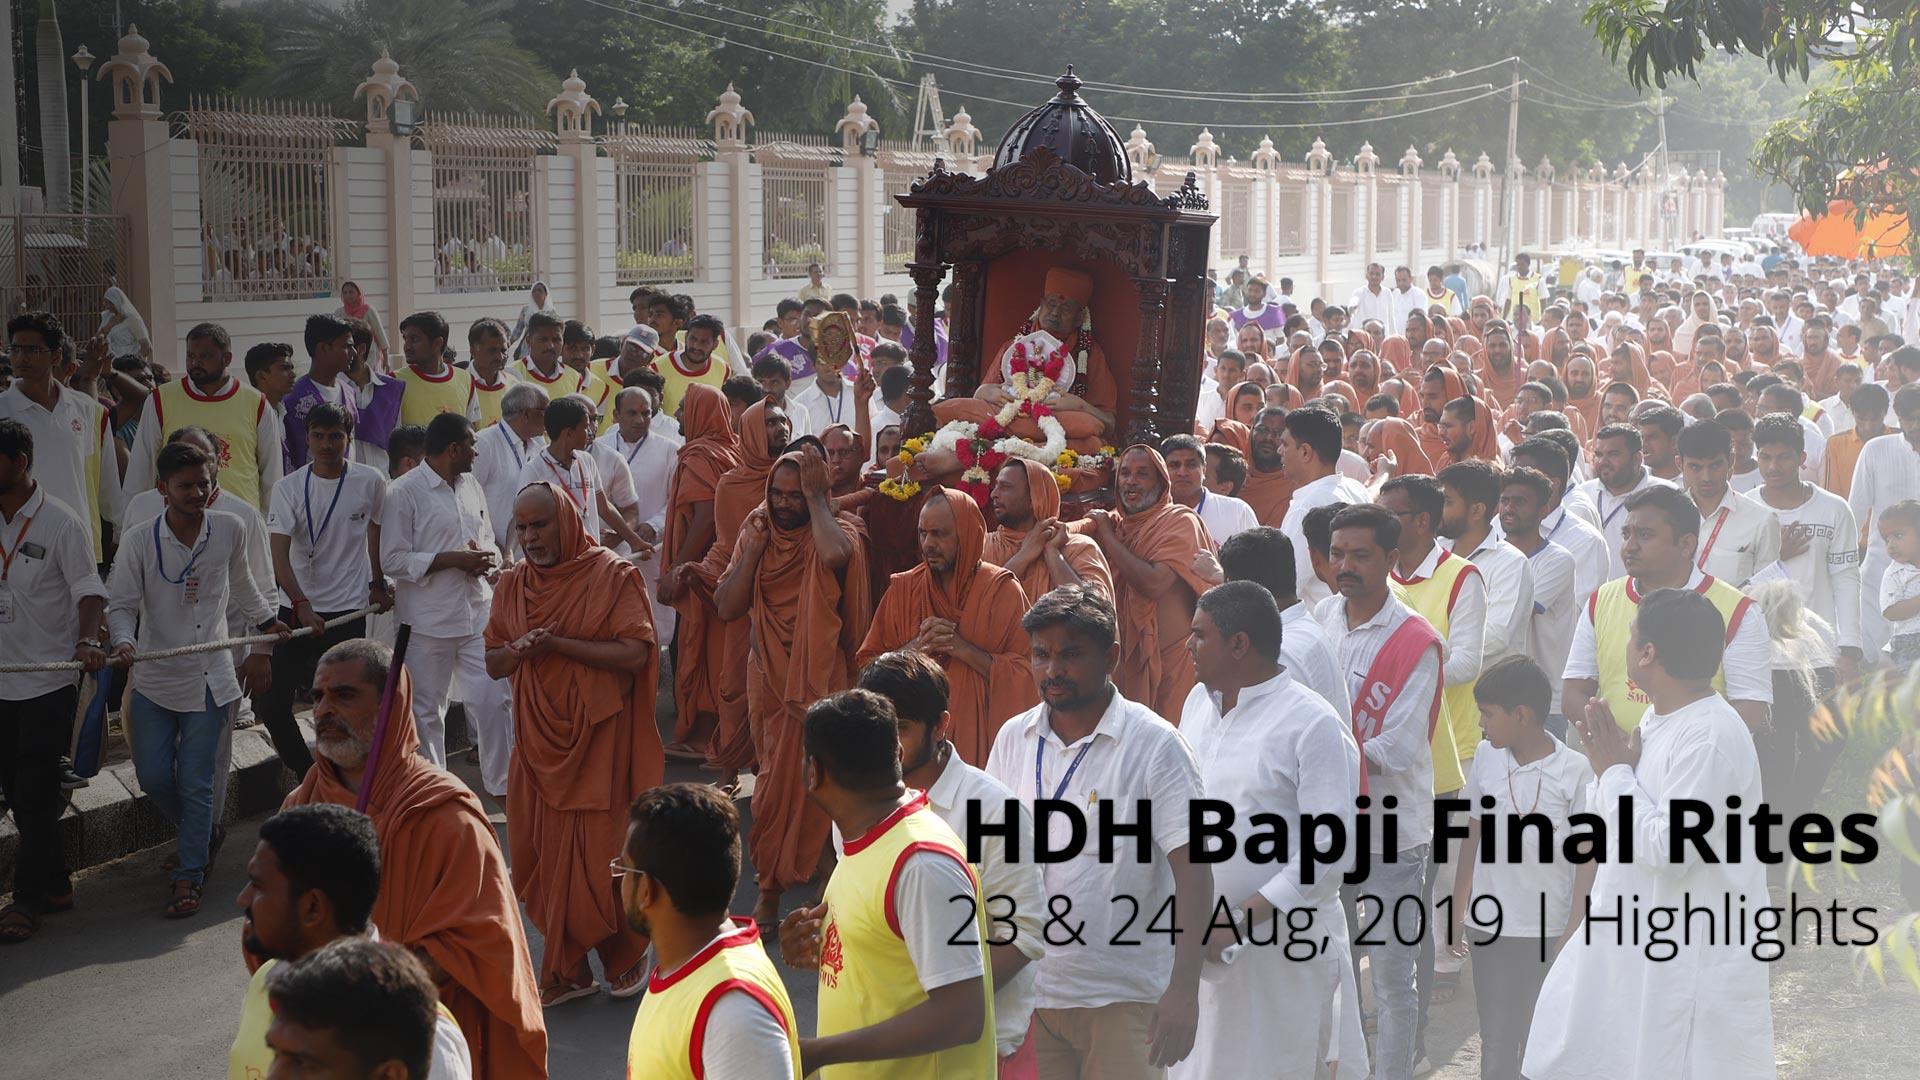 HDH Bapji Final Rites | 23 & 24 Aug, 2019 | Highlights